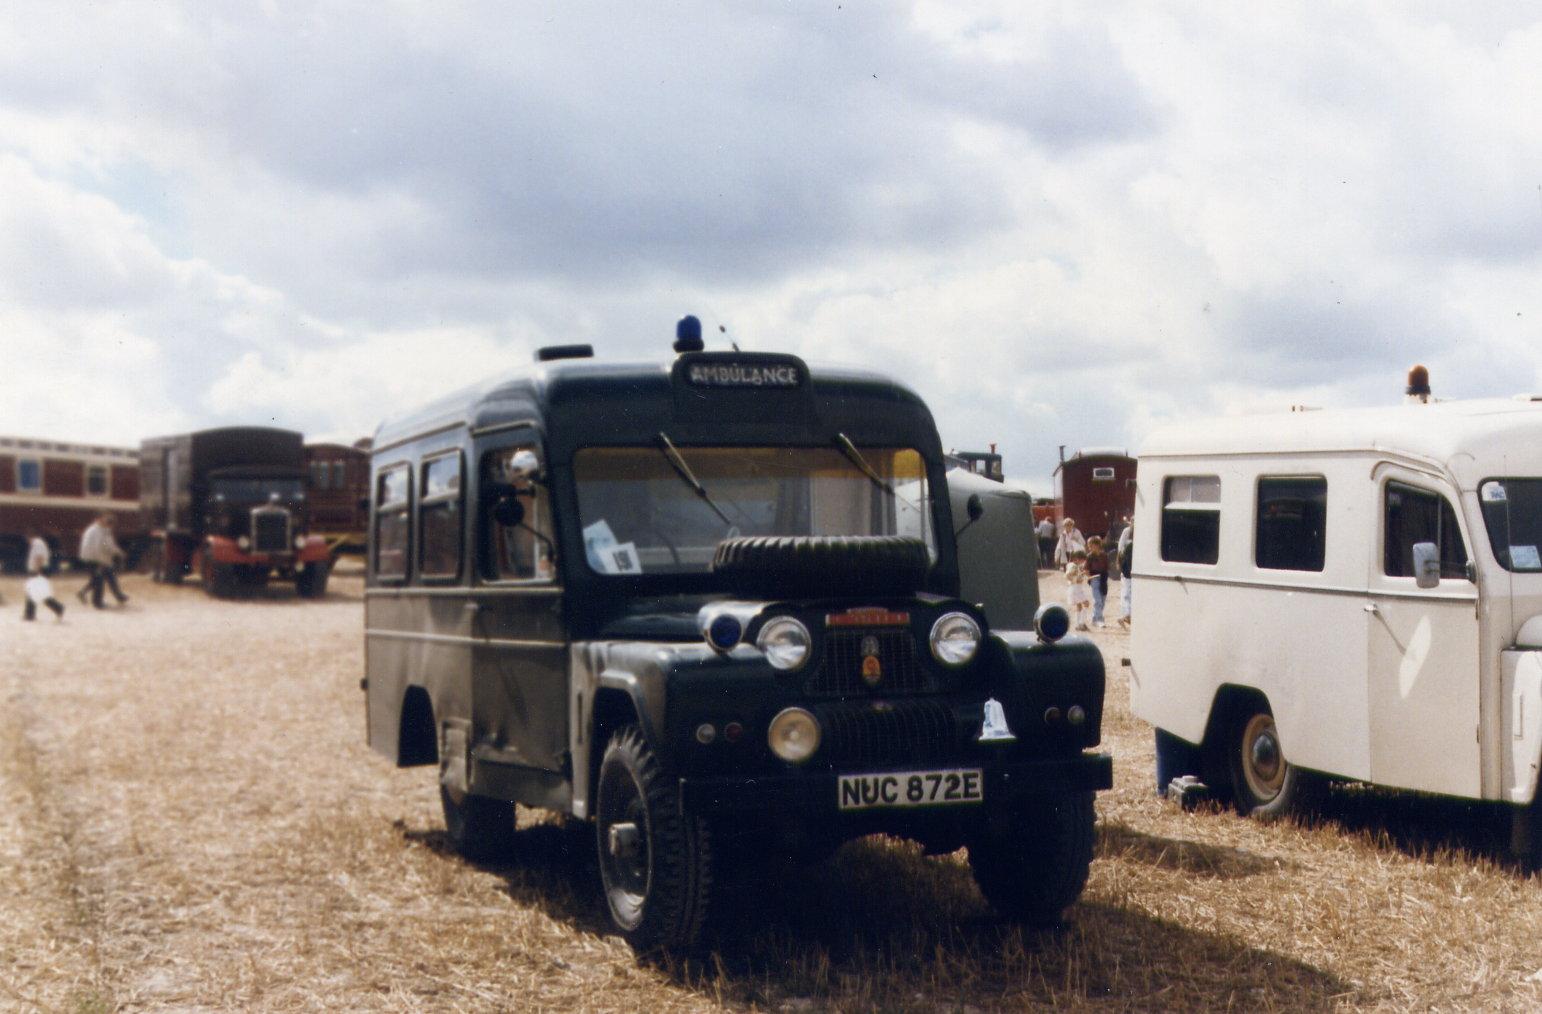 austin-gipsy-lwb-ambulance-nuc-872-e.jpg